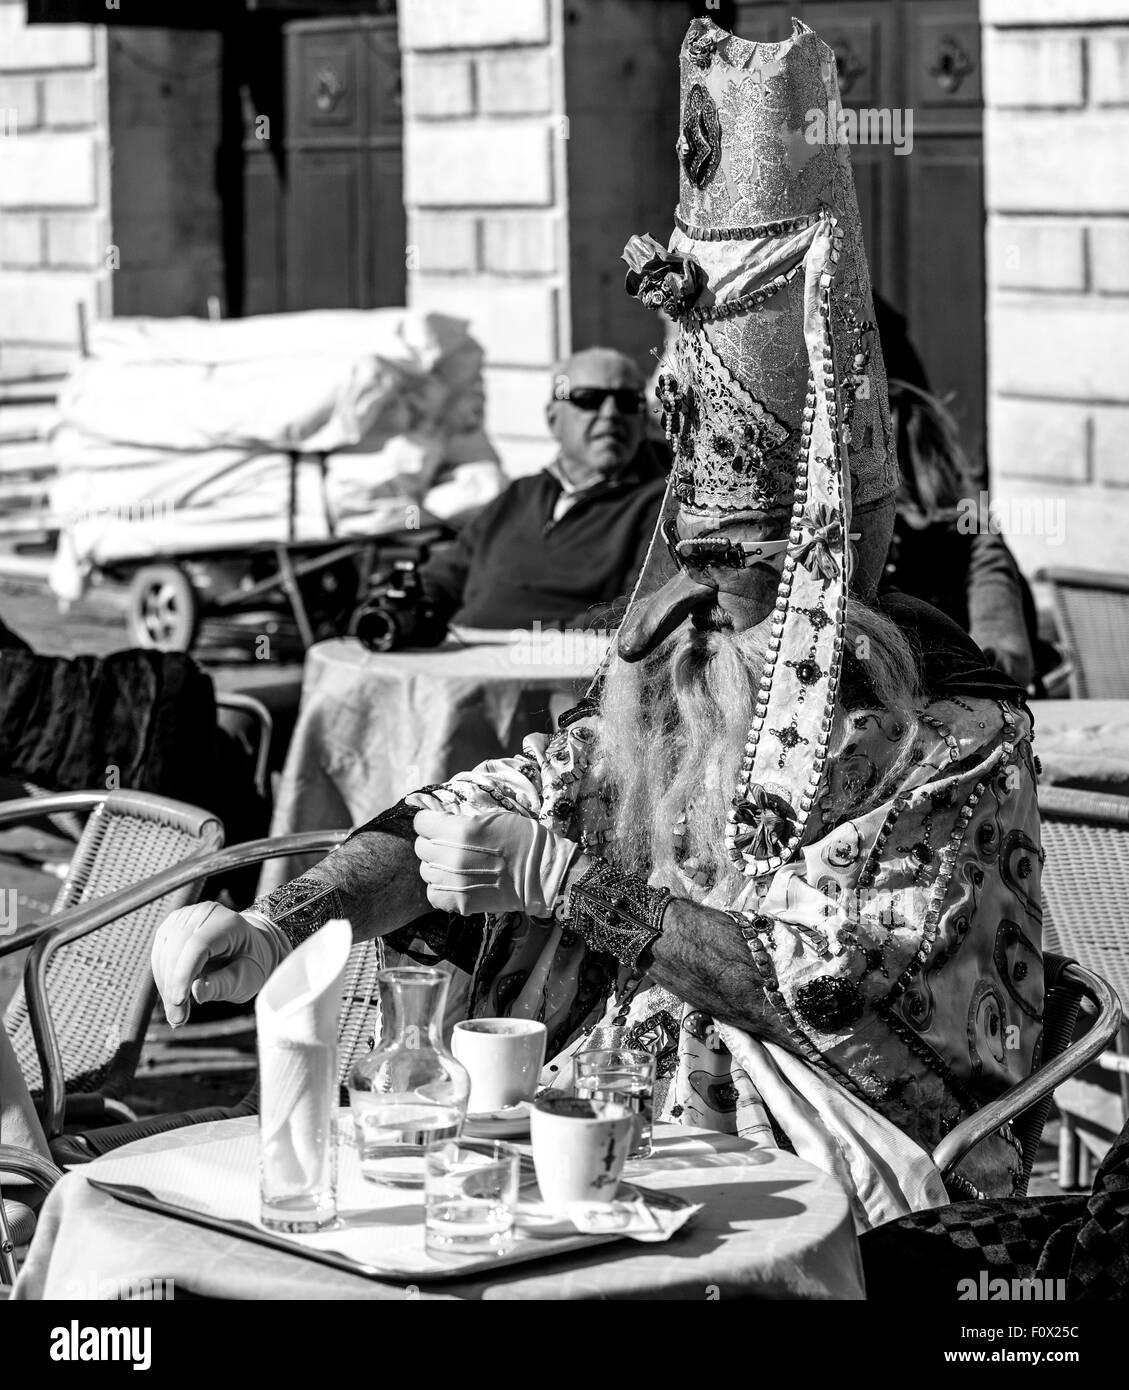 A costumed carnival goer has a coffee break near St. Marks Square - Stock Image